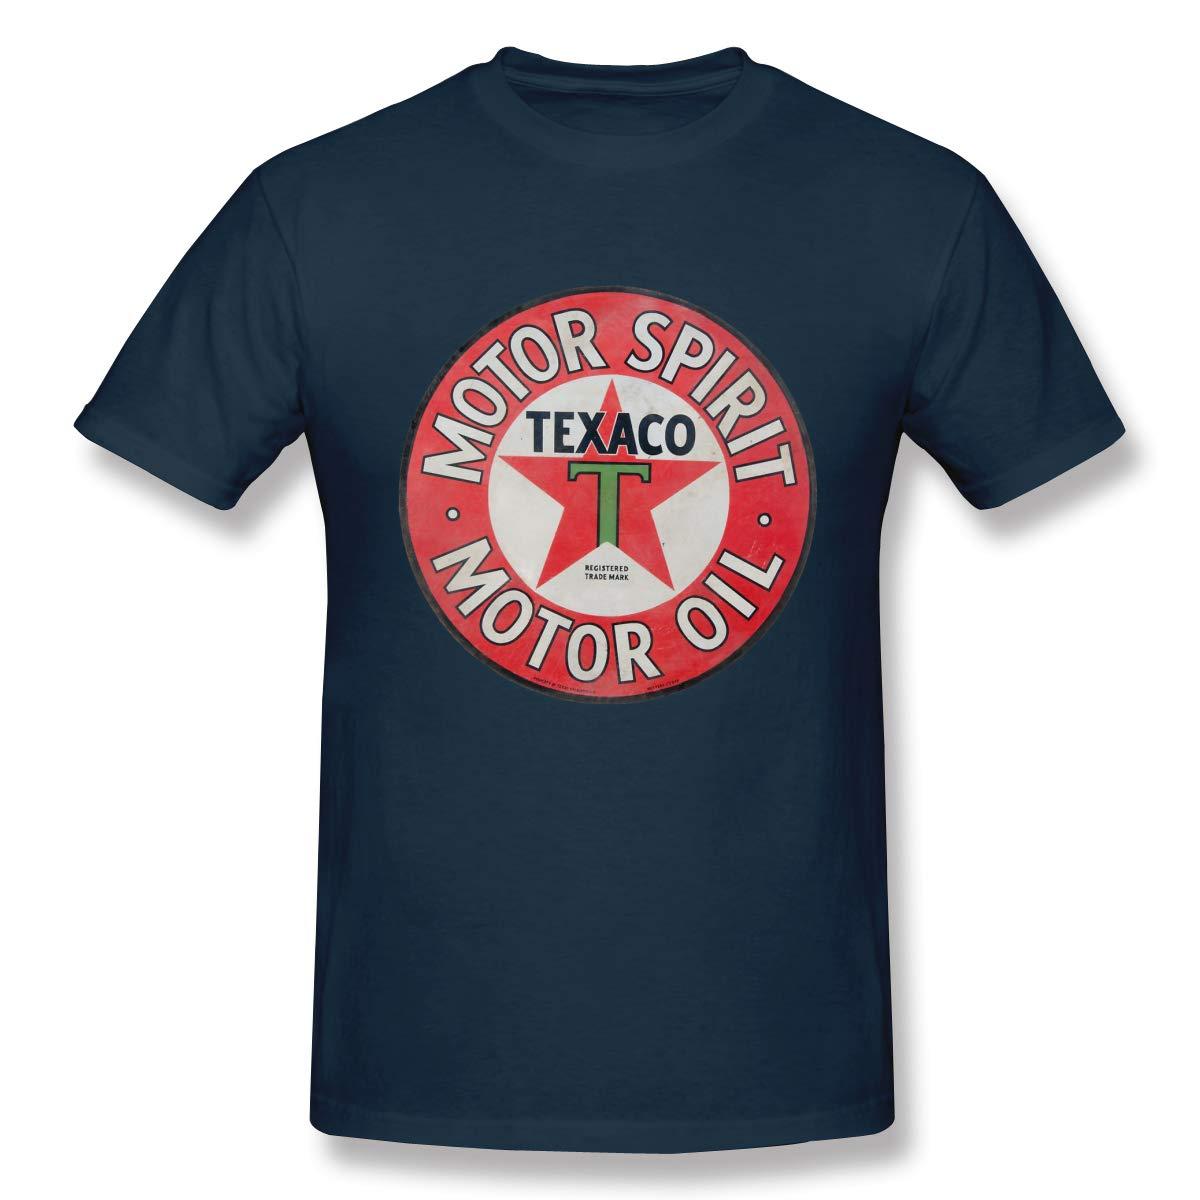 Motor Spirit Motor Oil Graphic Short Sleeve Shirts